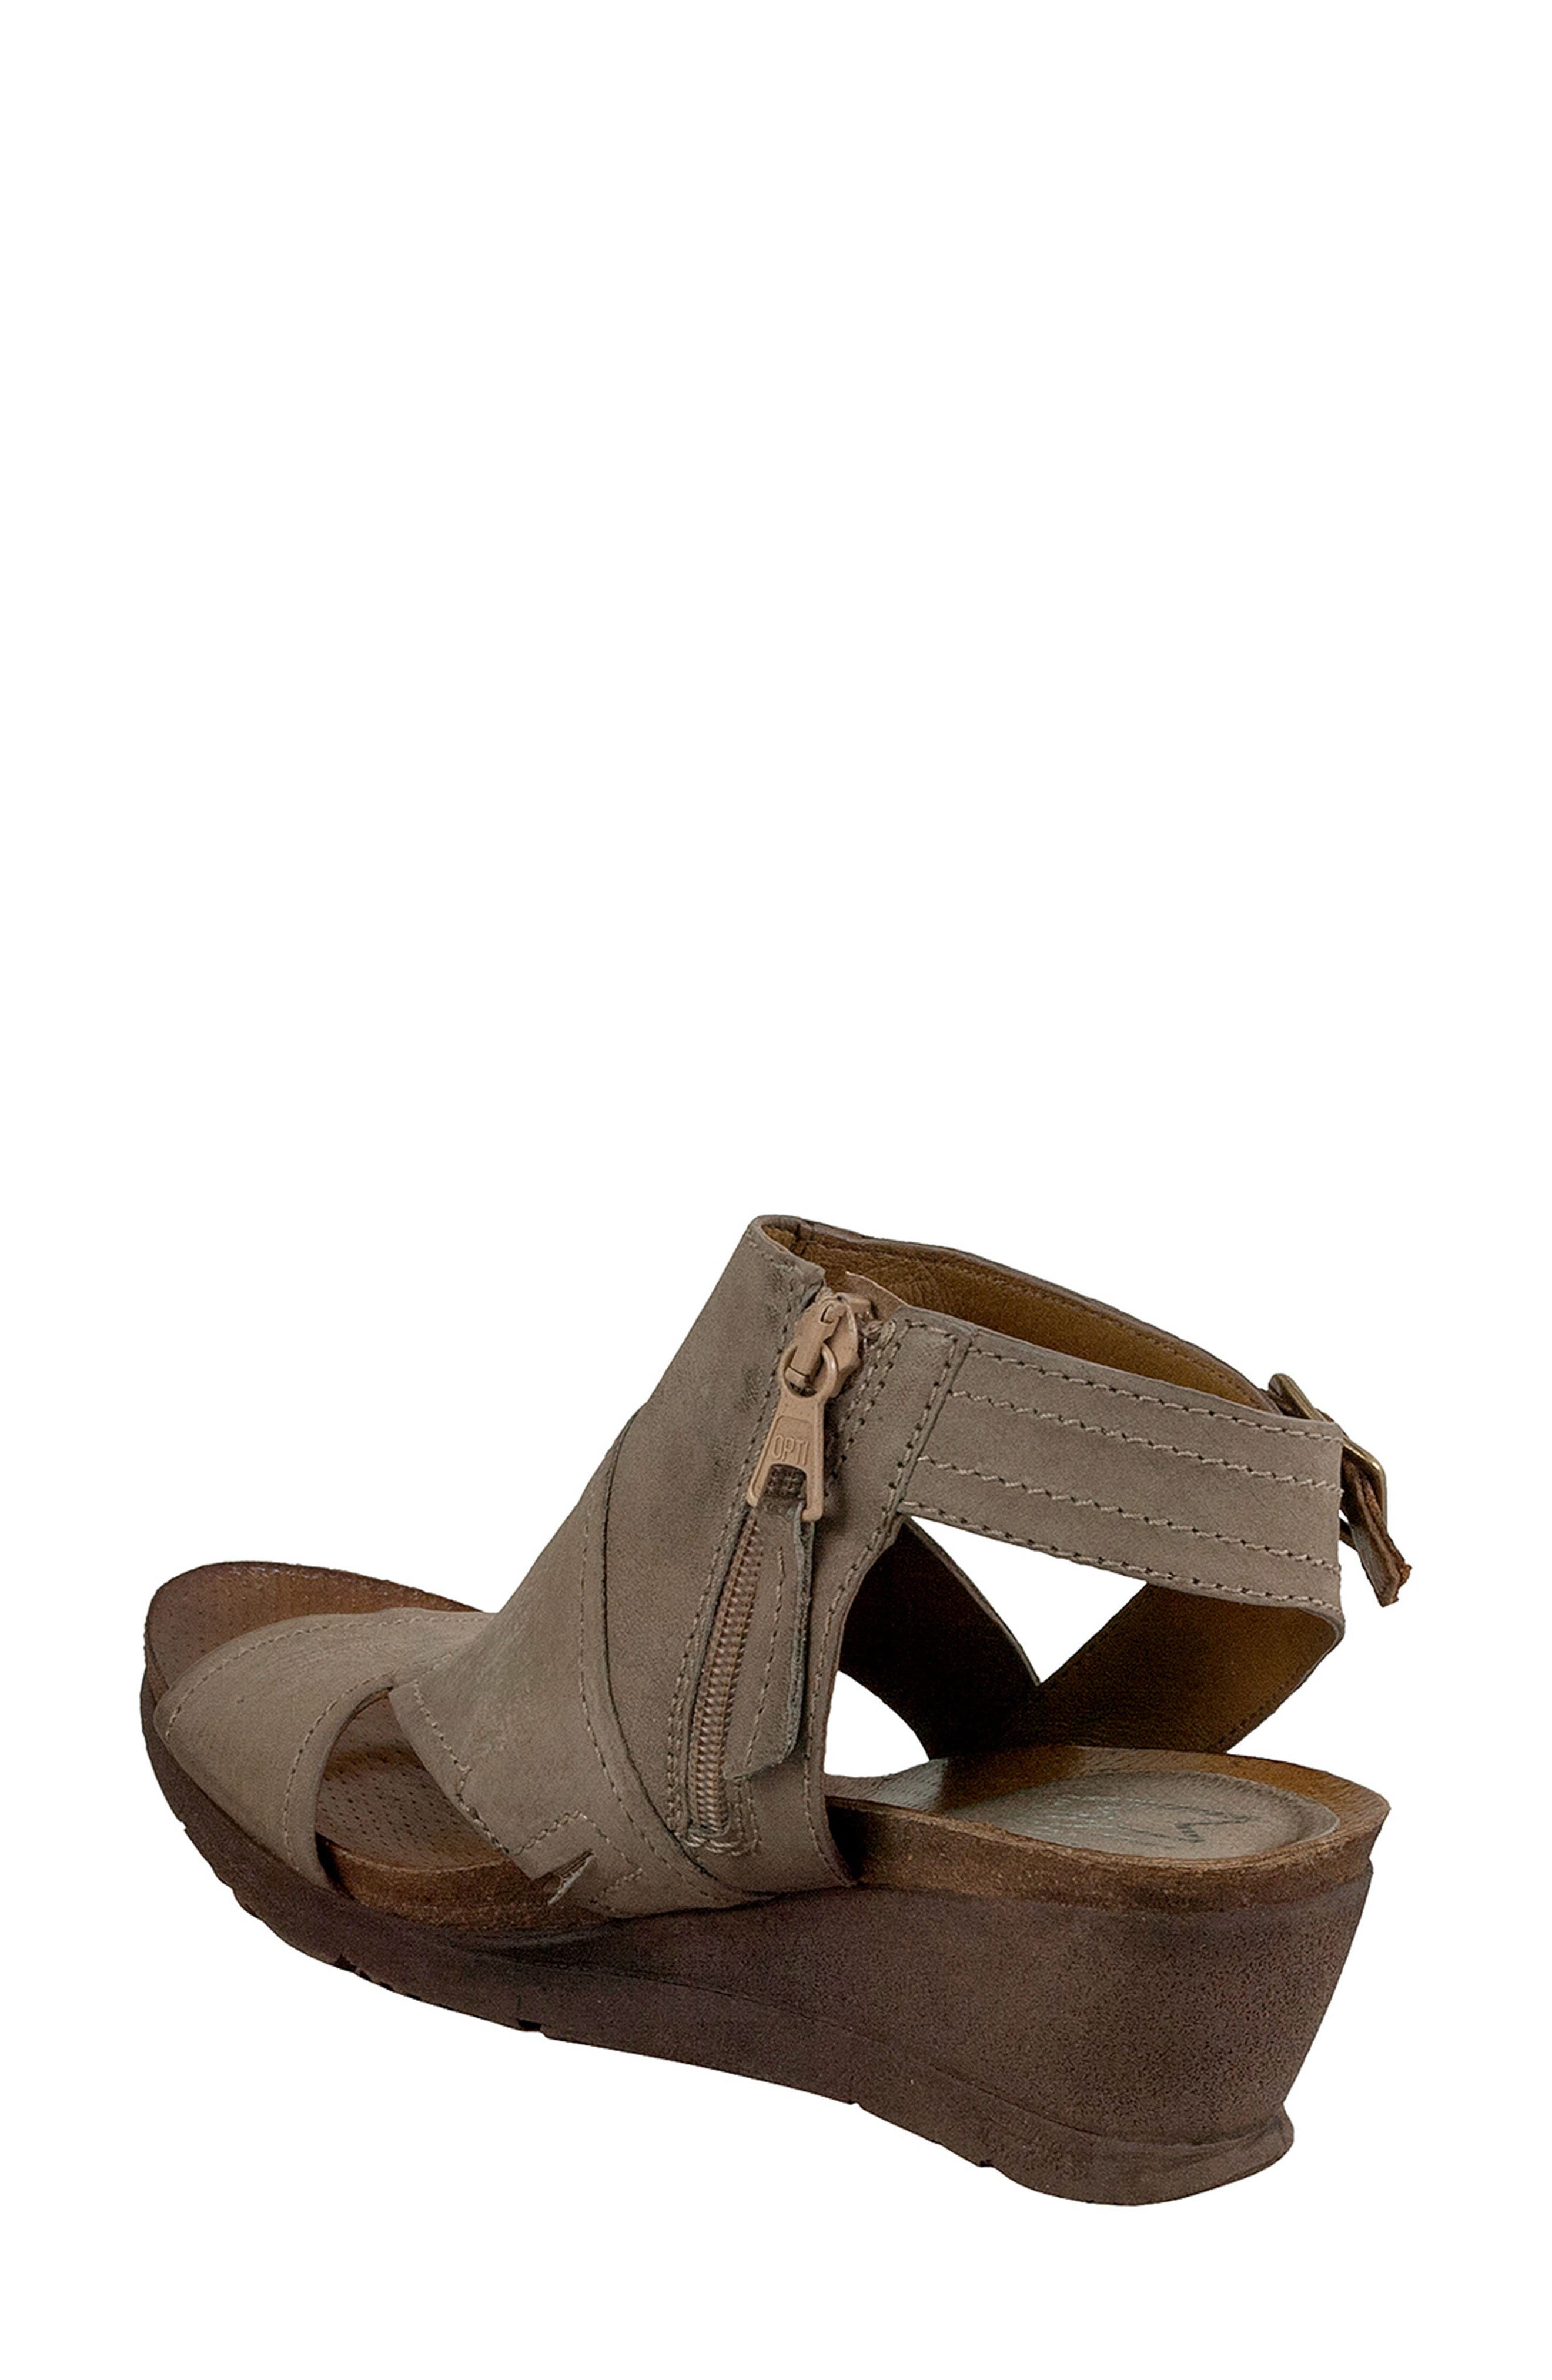 Scout Wedge Sandal,                             Alternate thumbnail 2, color,                             Pebble Leather